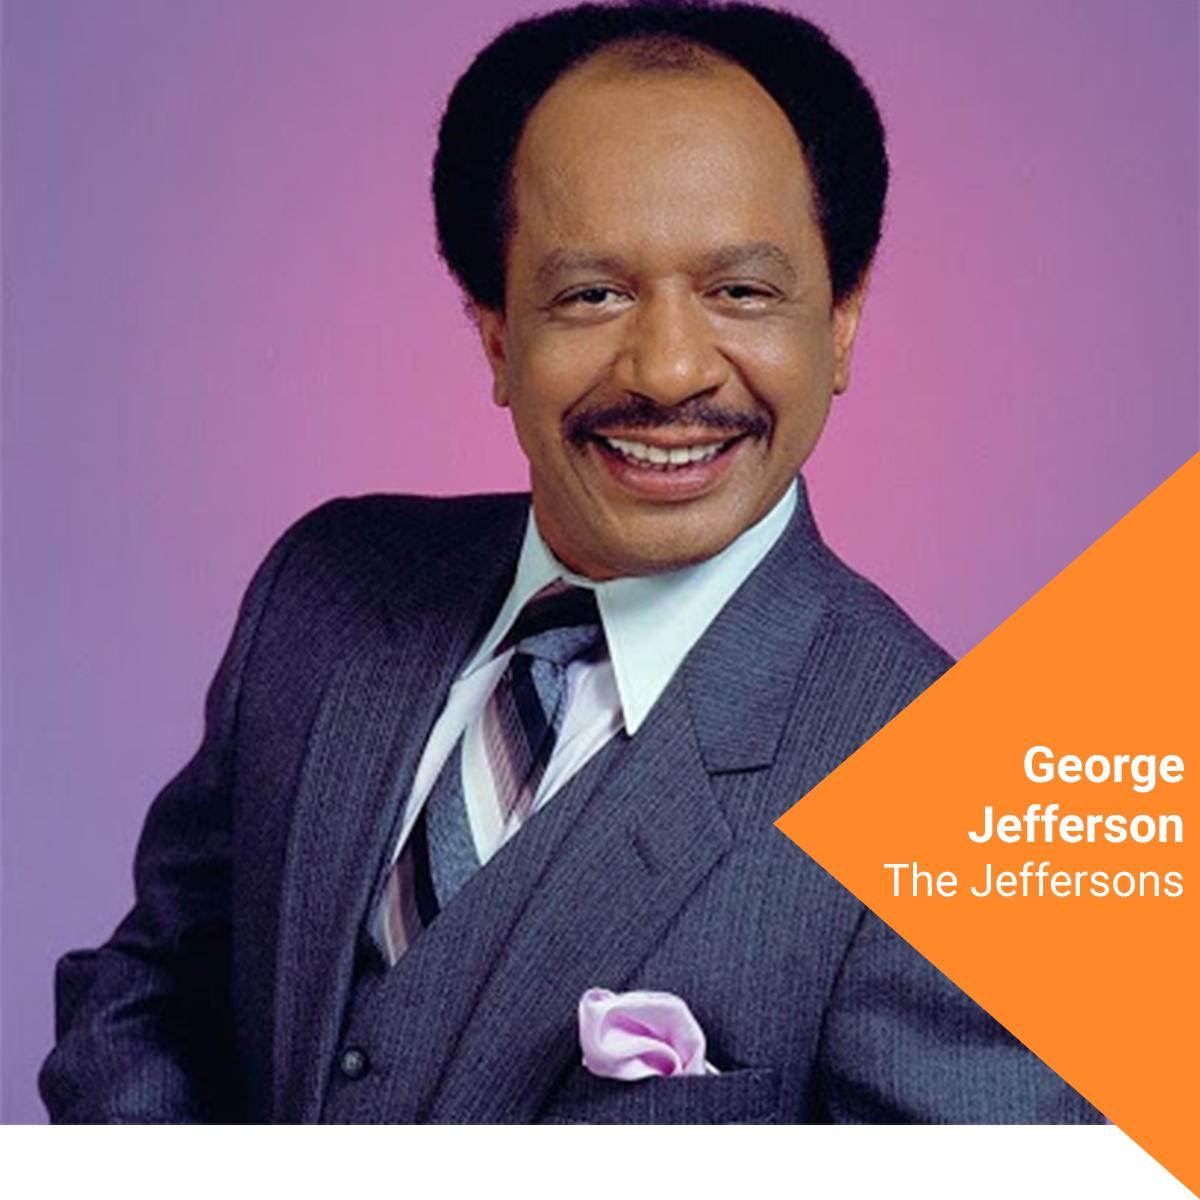 Image of George Jefferson